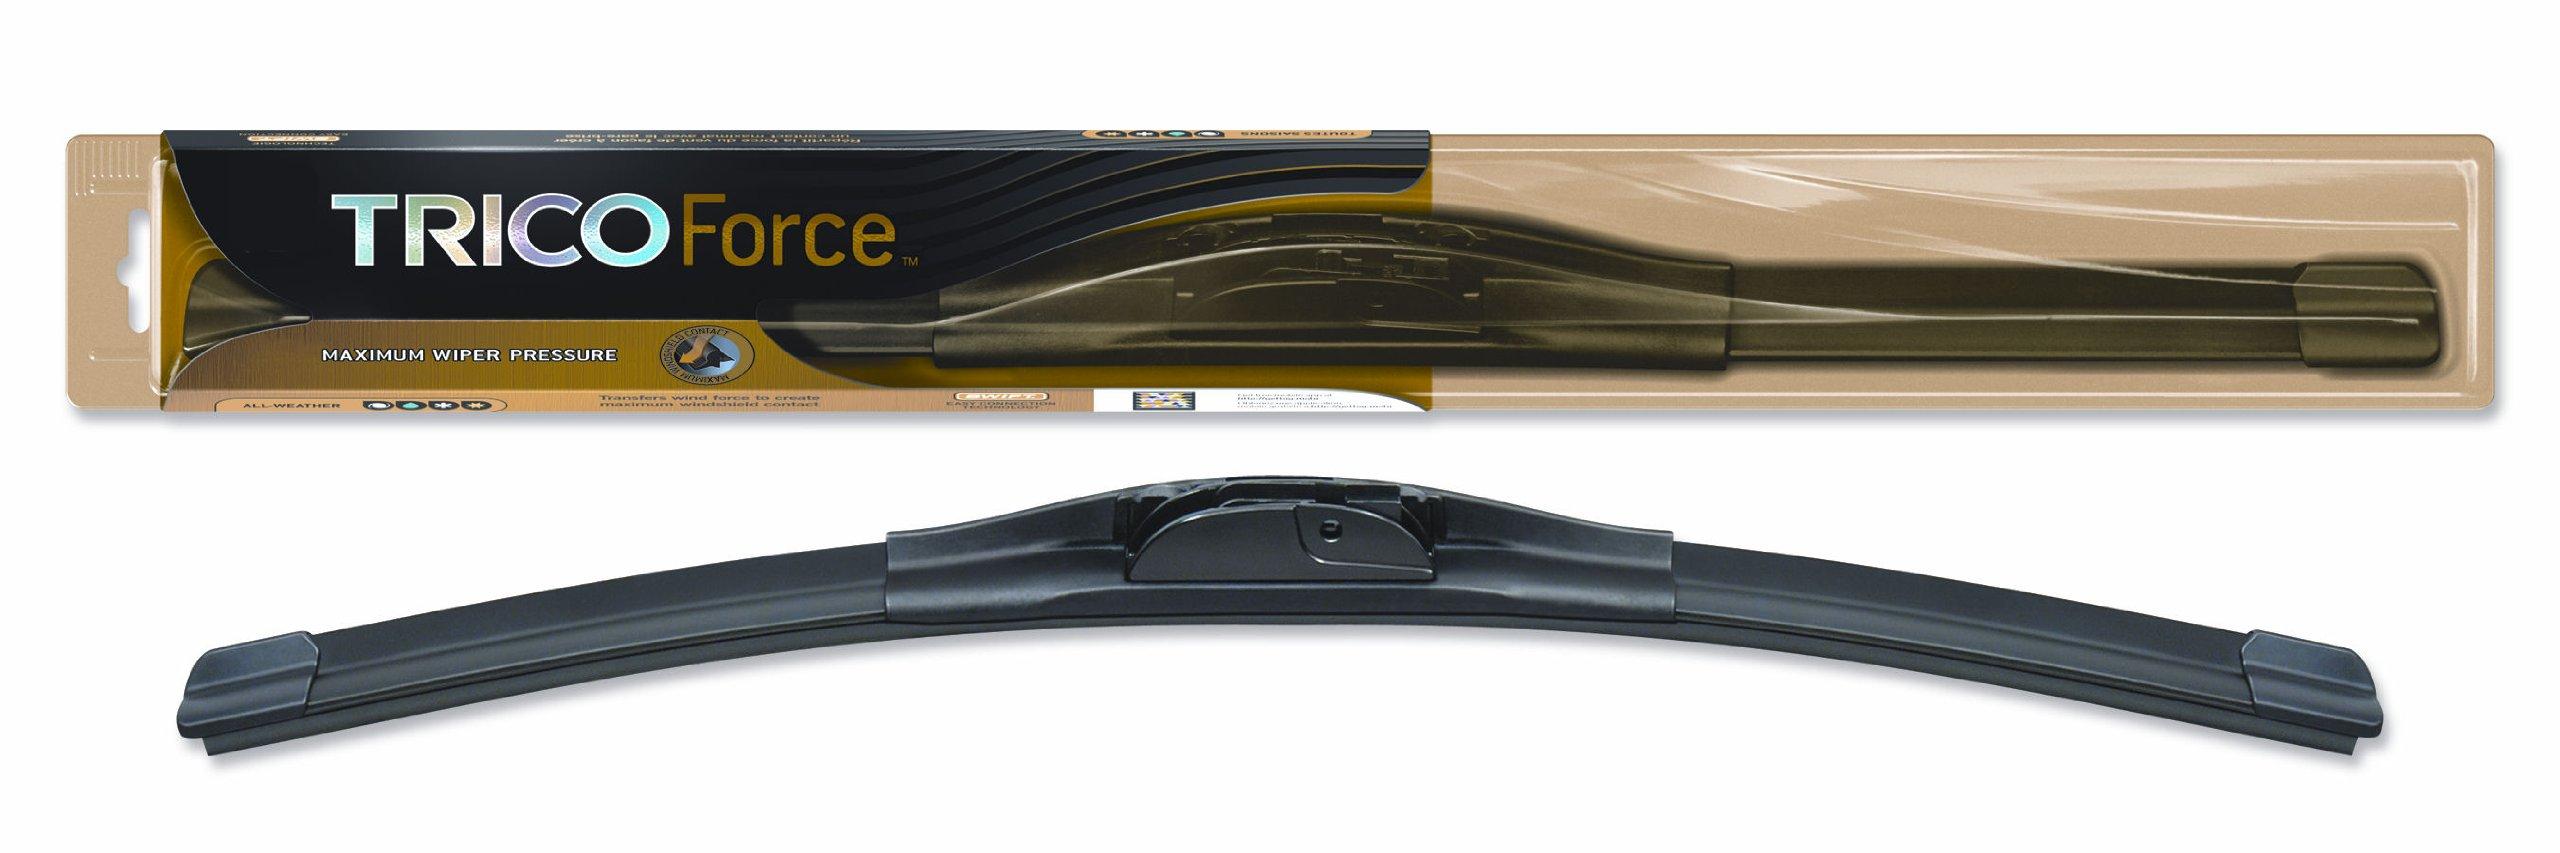 Trico 25-150 Force Premium Performance Beam Wiper Blade, 15''